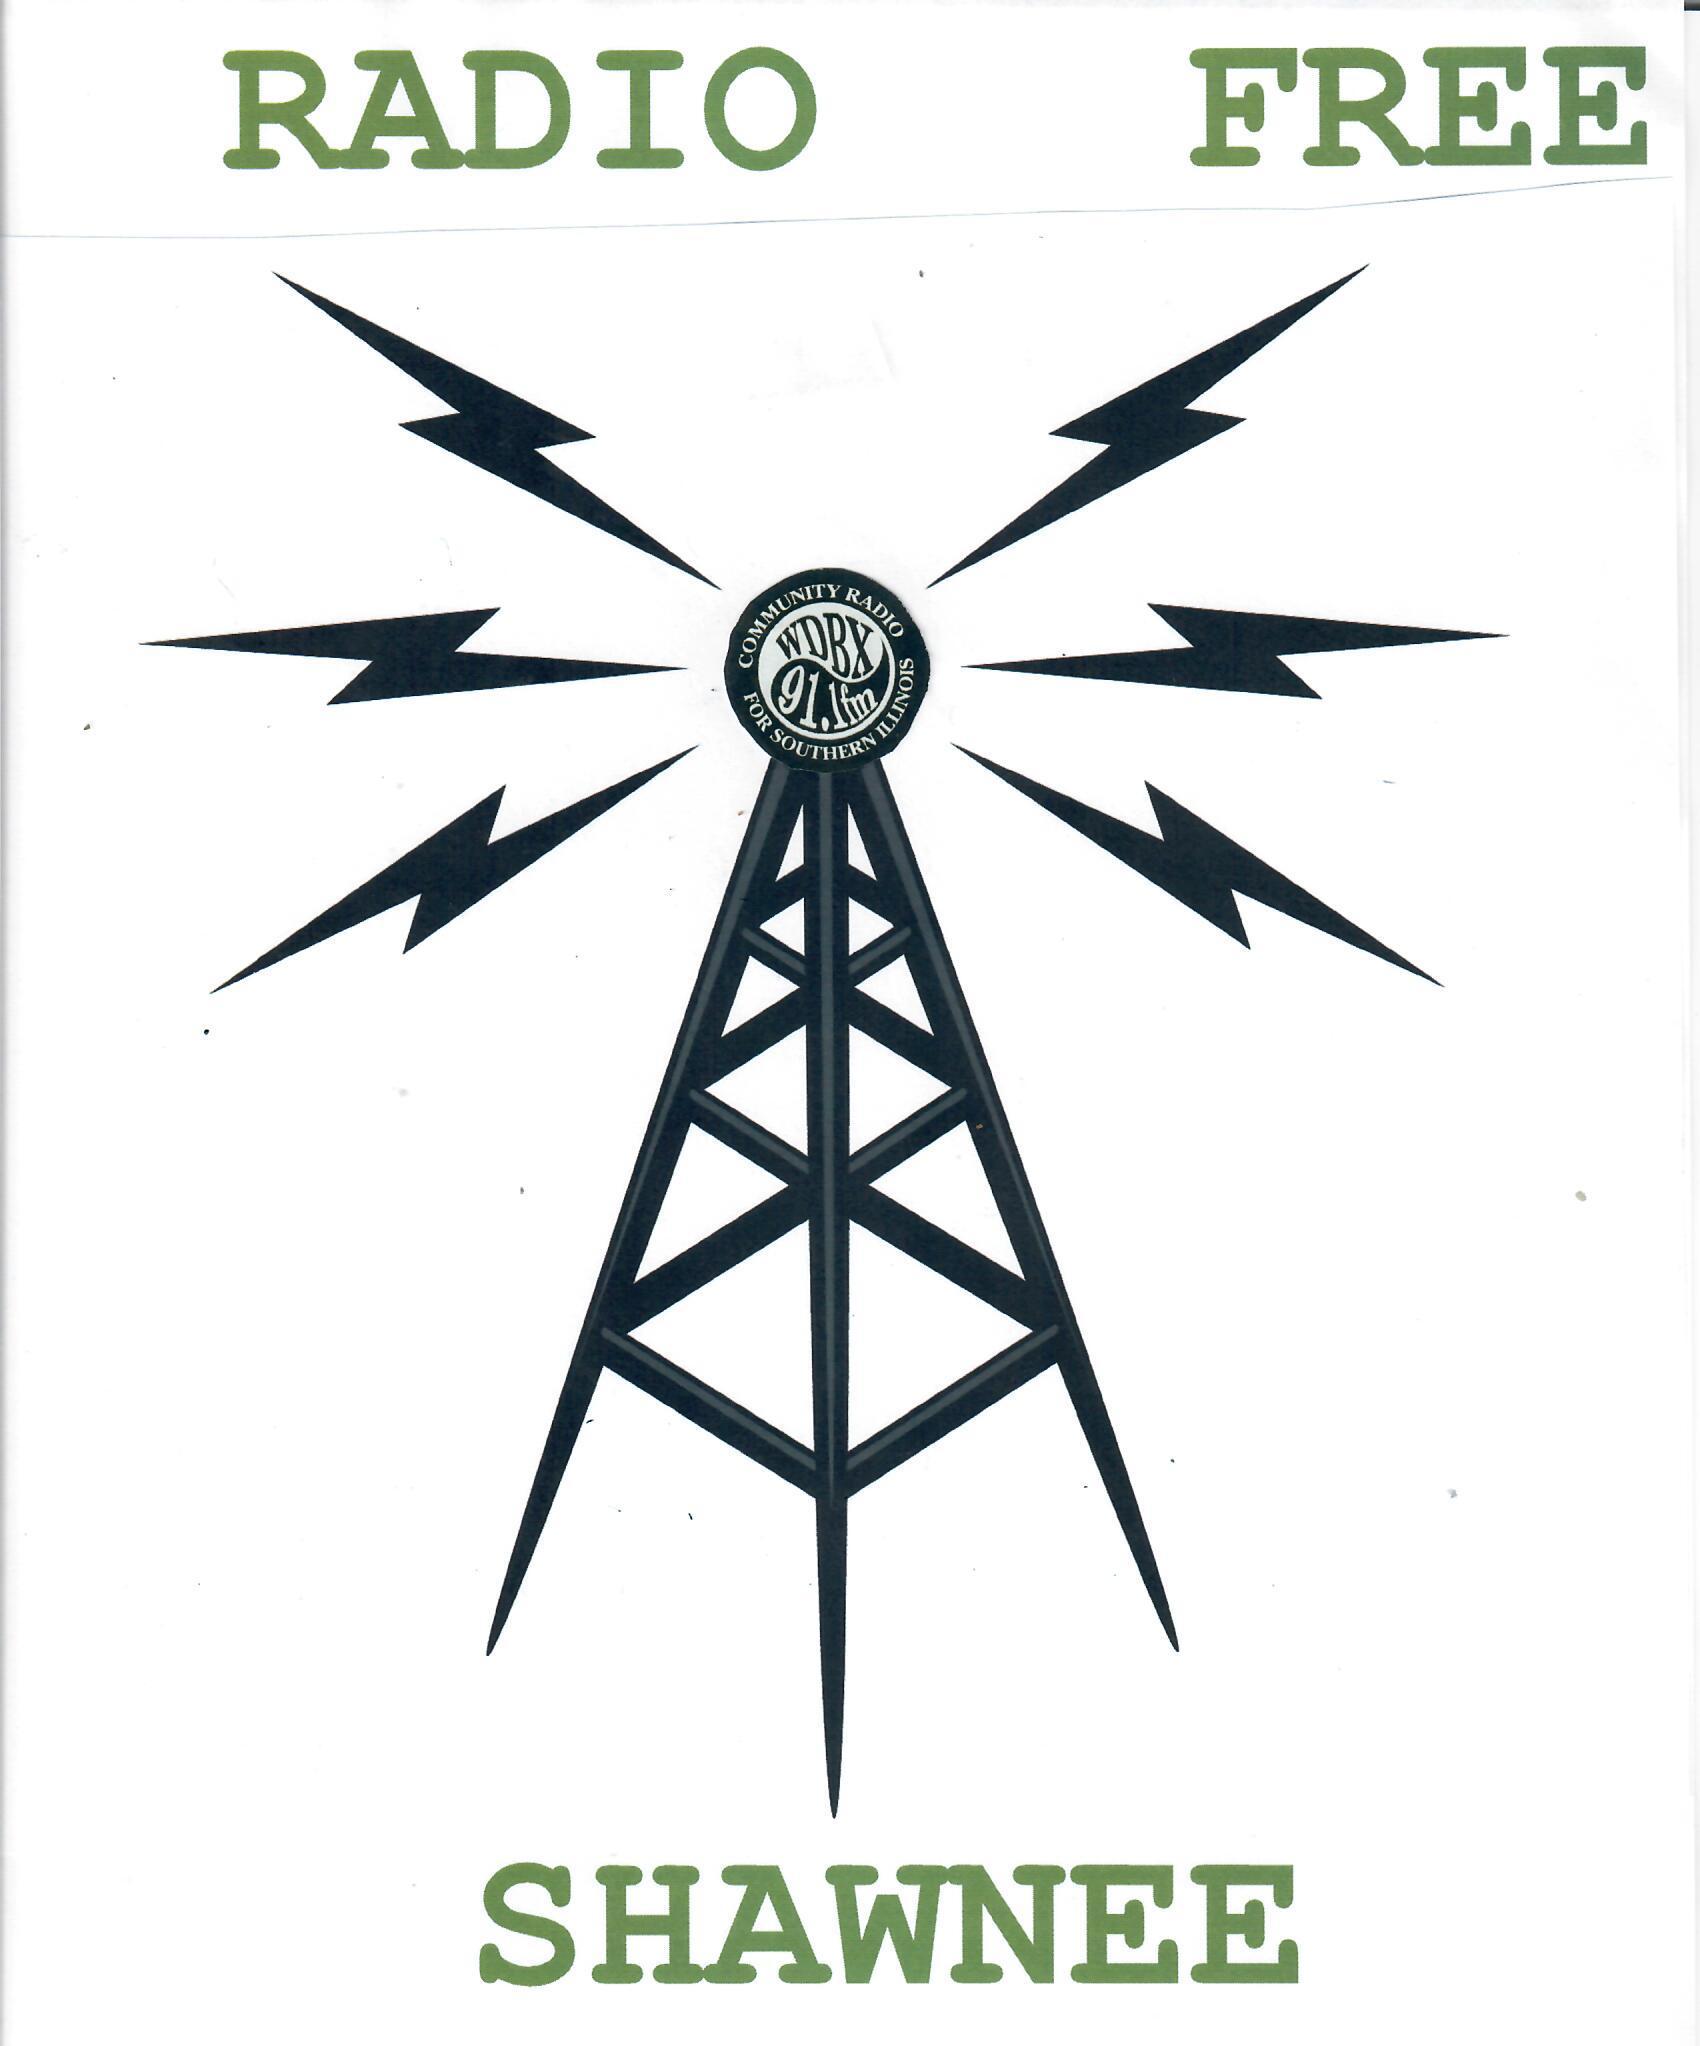 Radio Free Shawnee